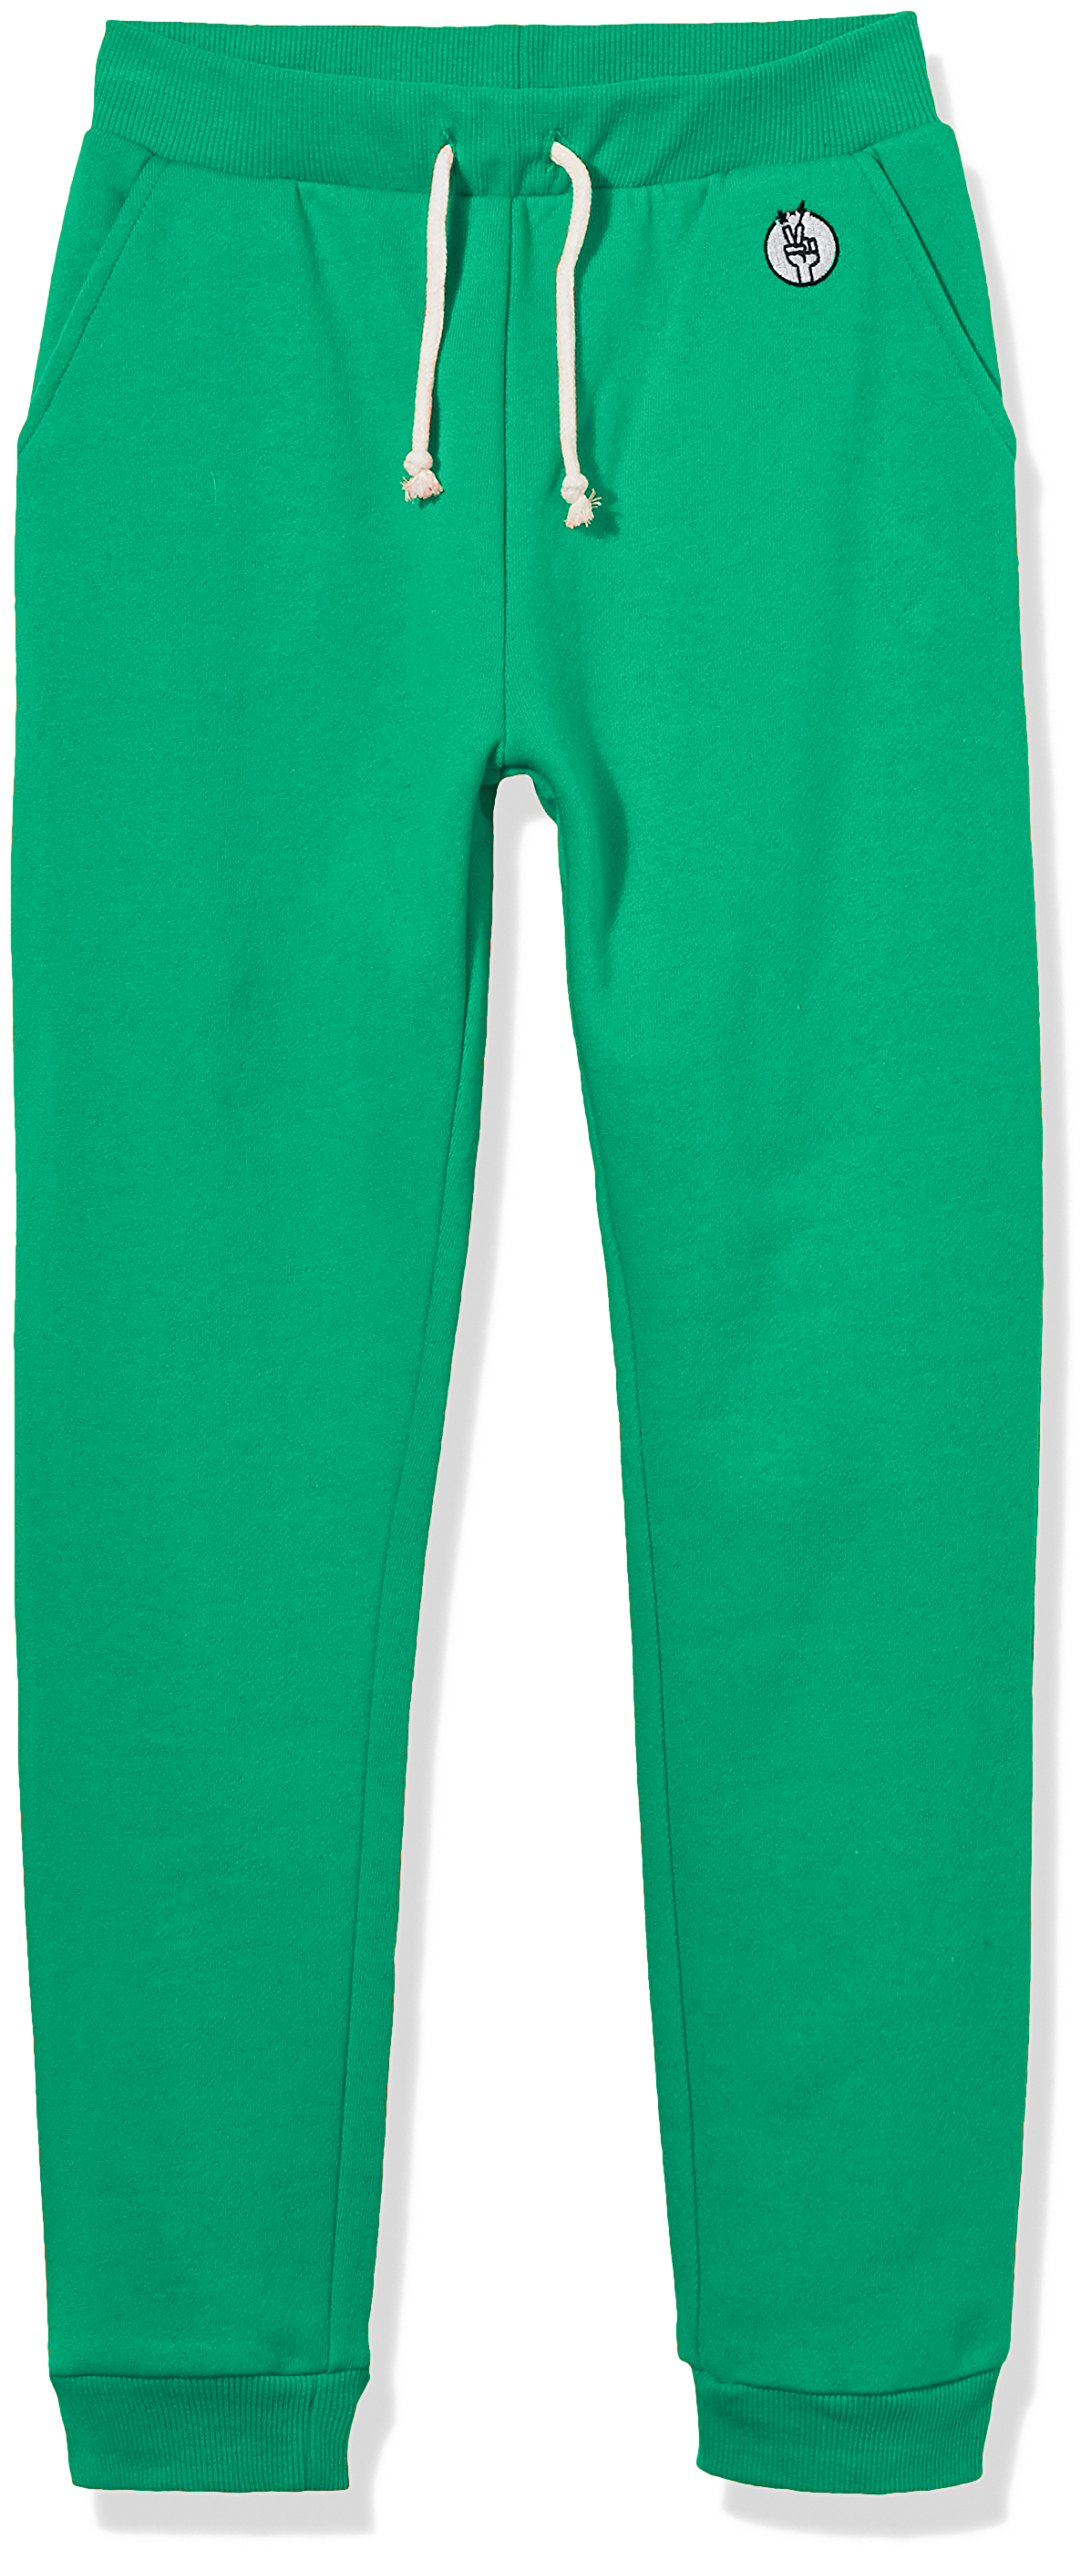 Kid Nation Kids' Fleece Jogger Pants for Boys or Girls M Green 01